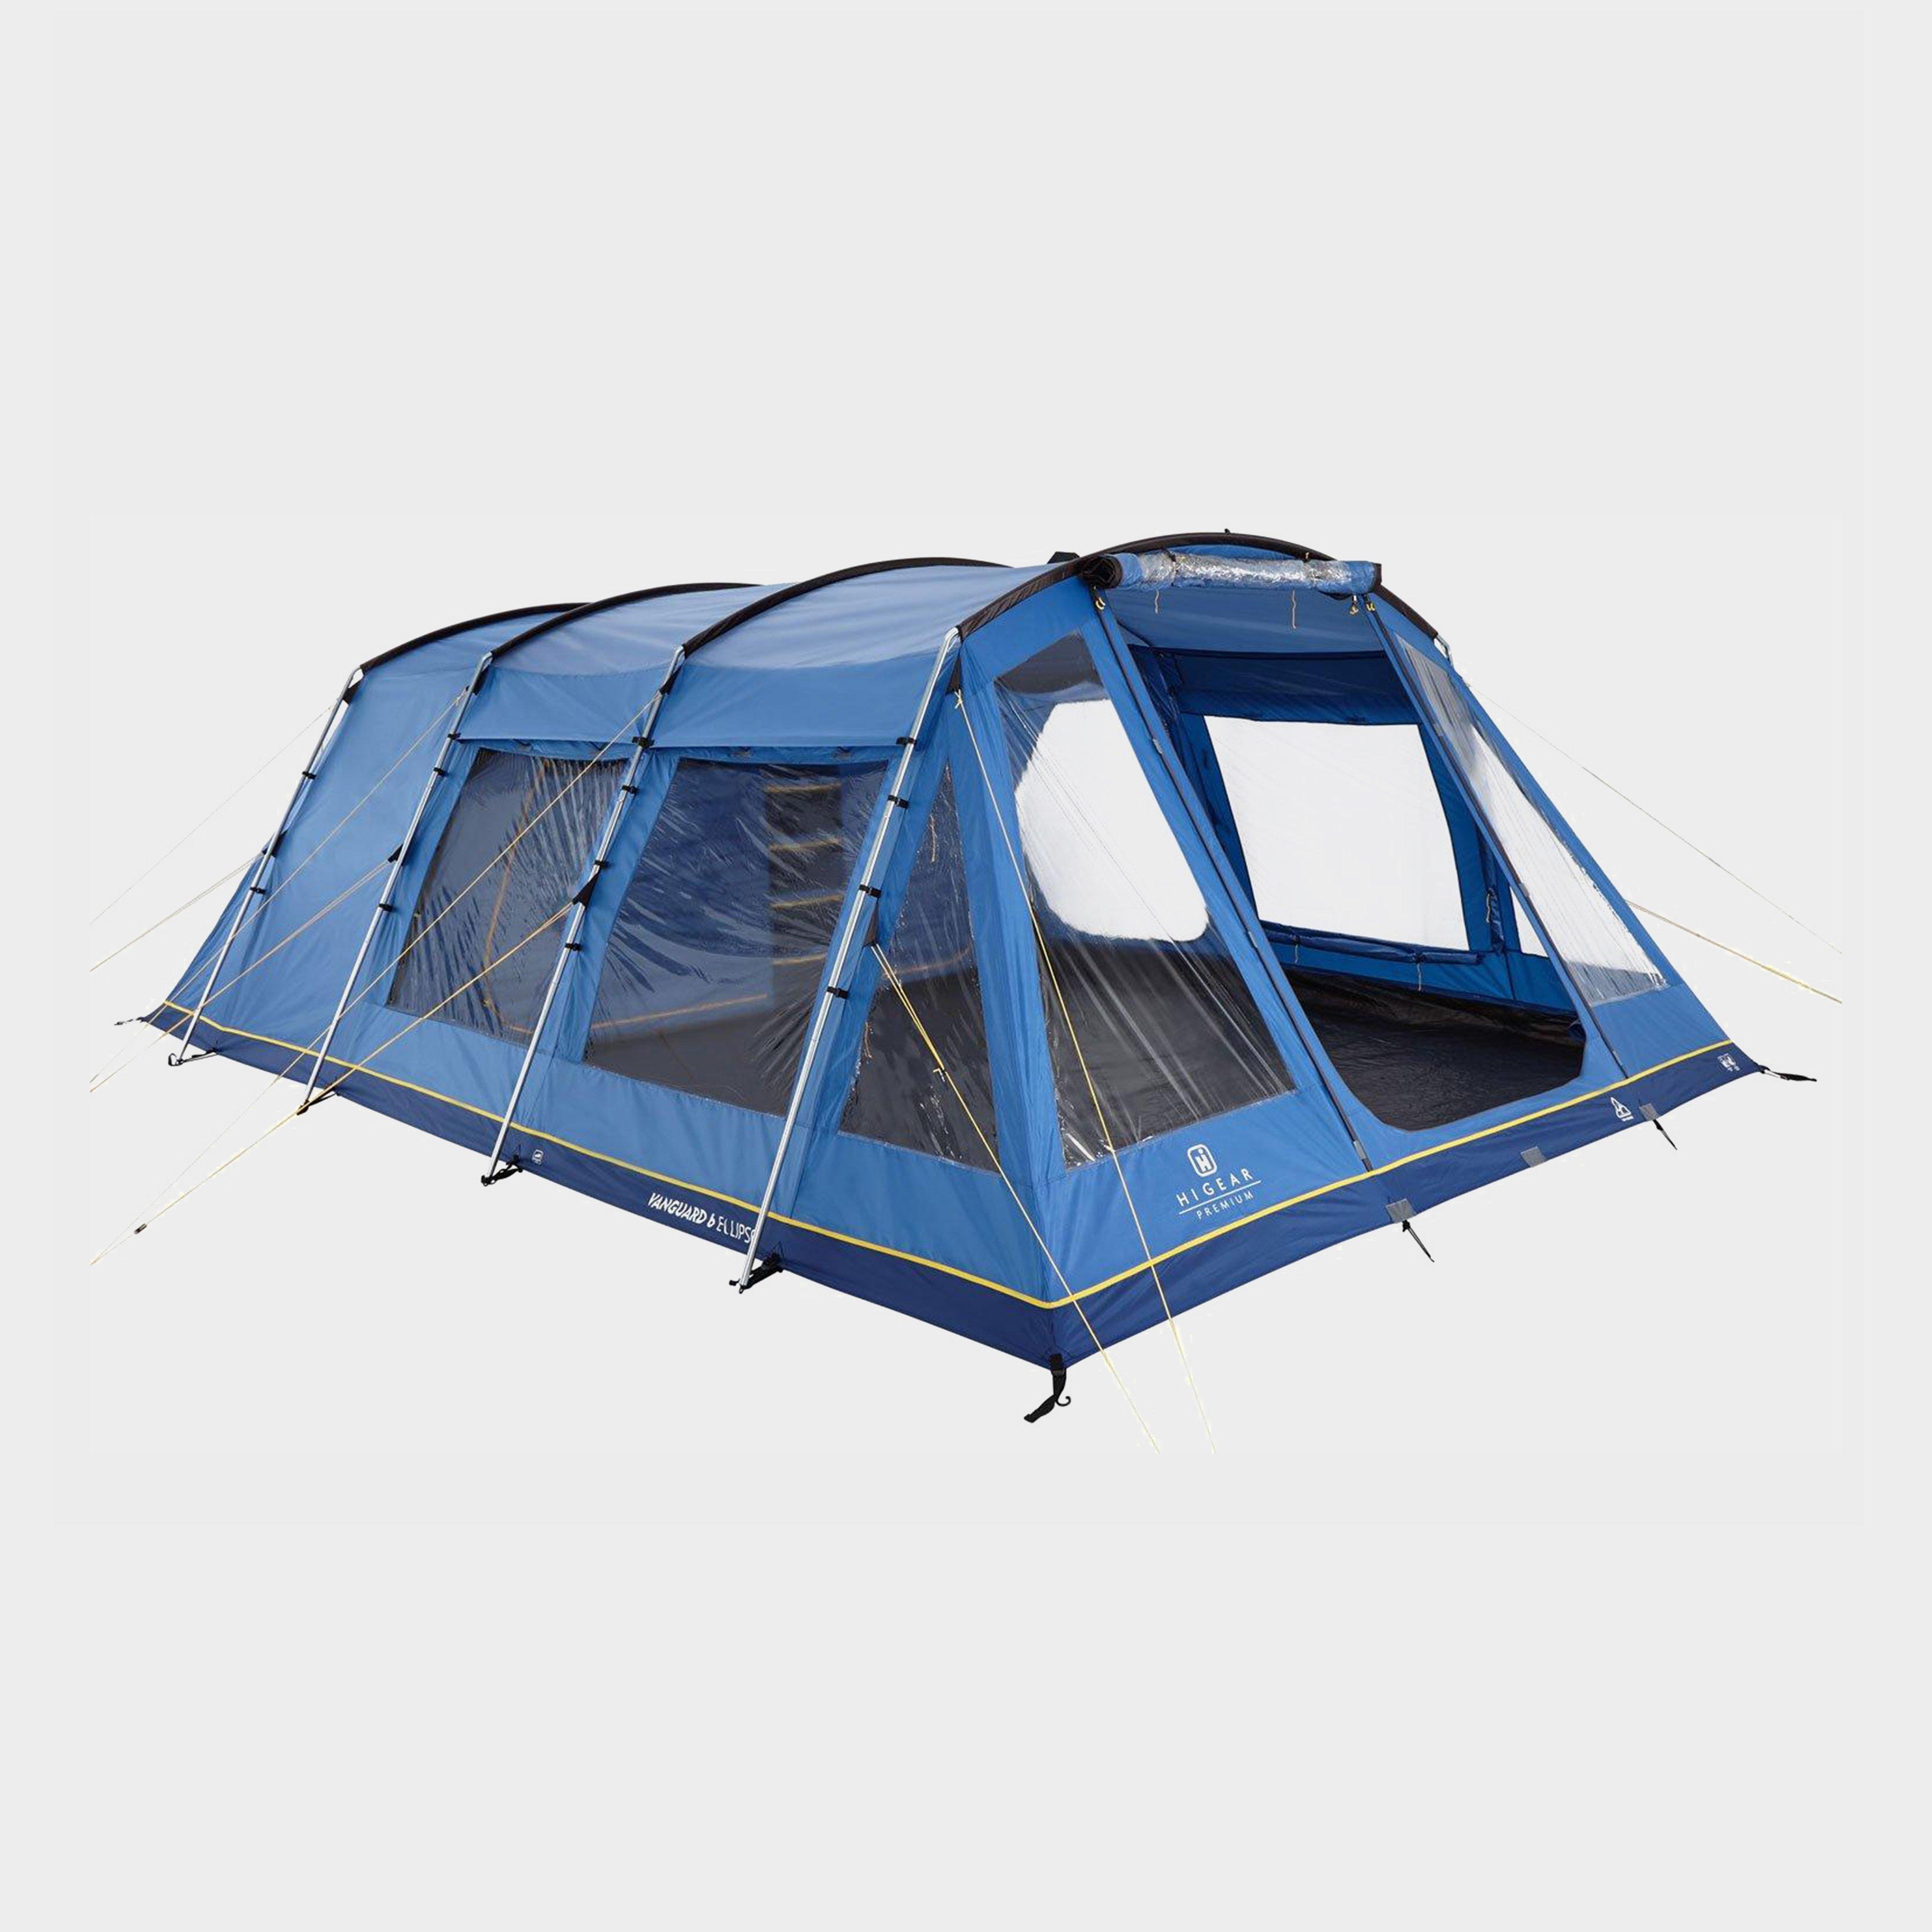 HI-GEAR Vanguard Nightfall 6 Tent, IGO/IGO